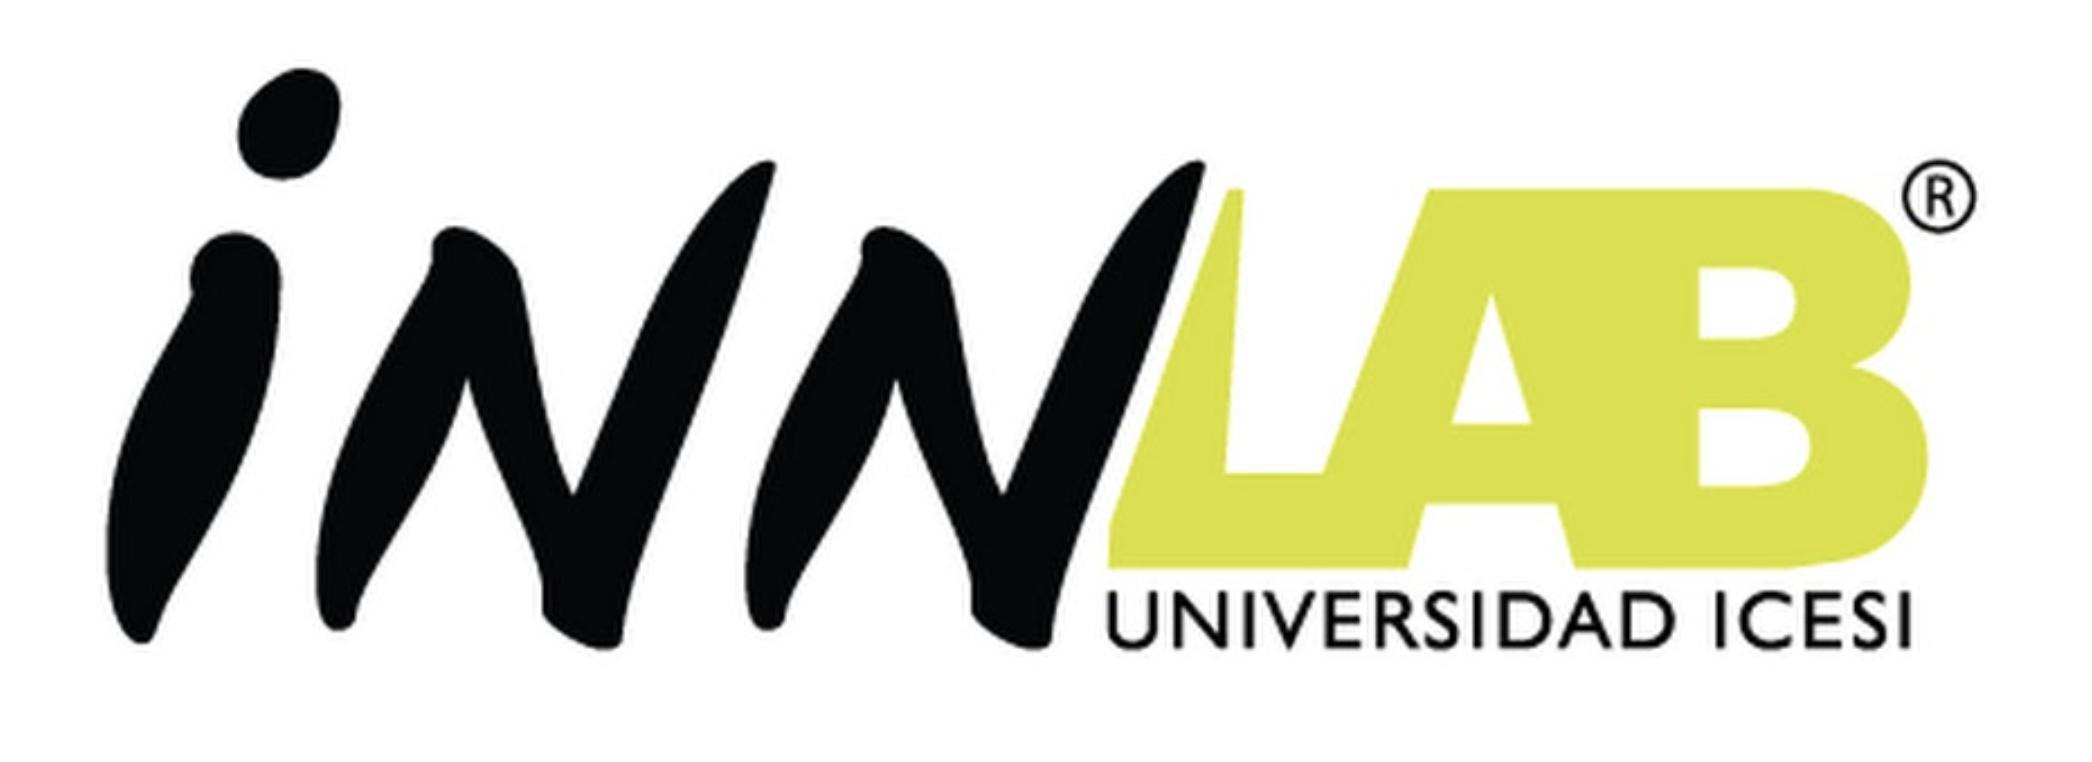 Innlab Universidad Icesi